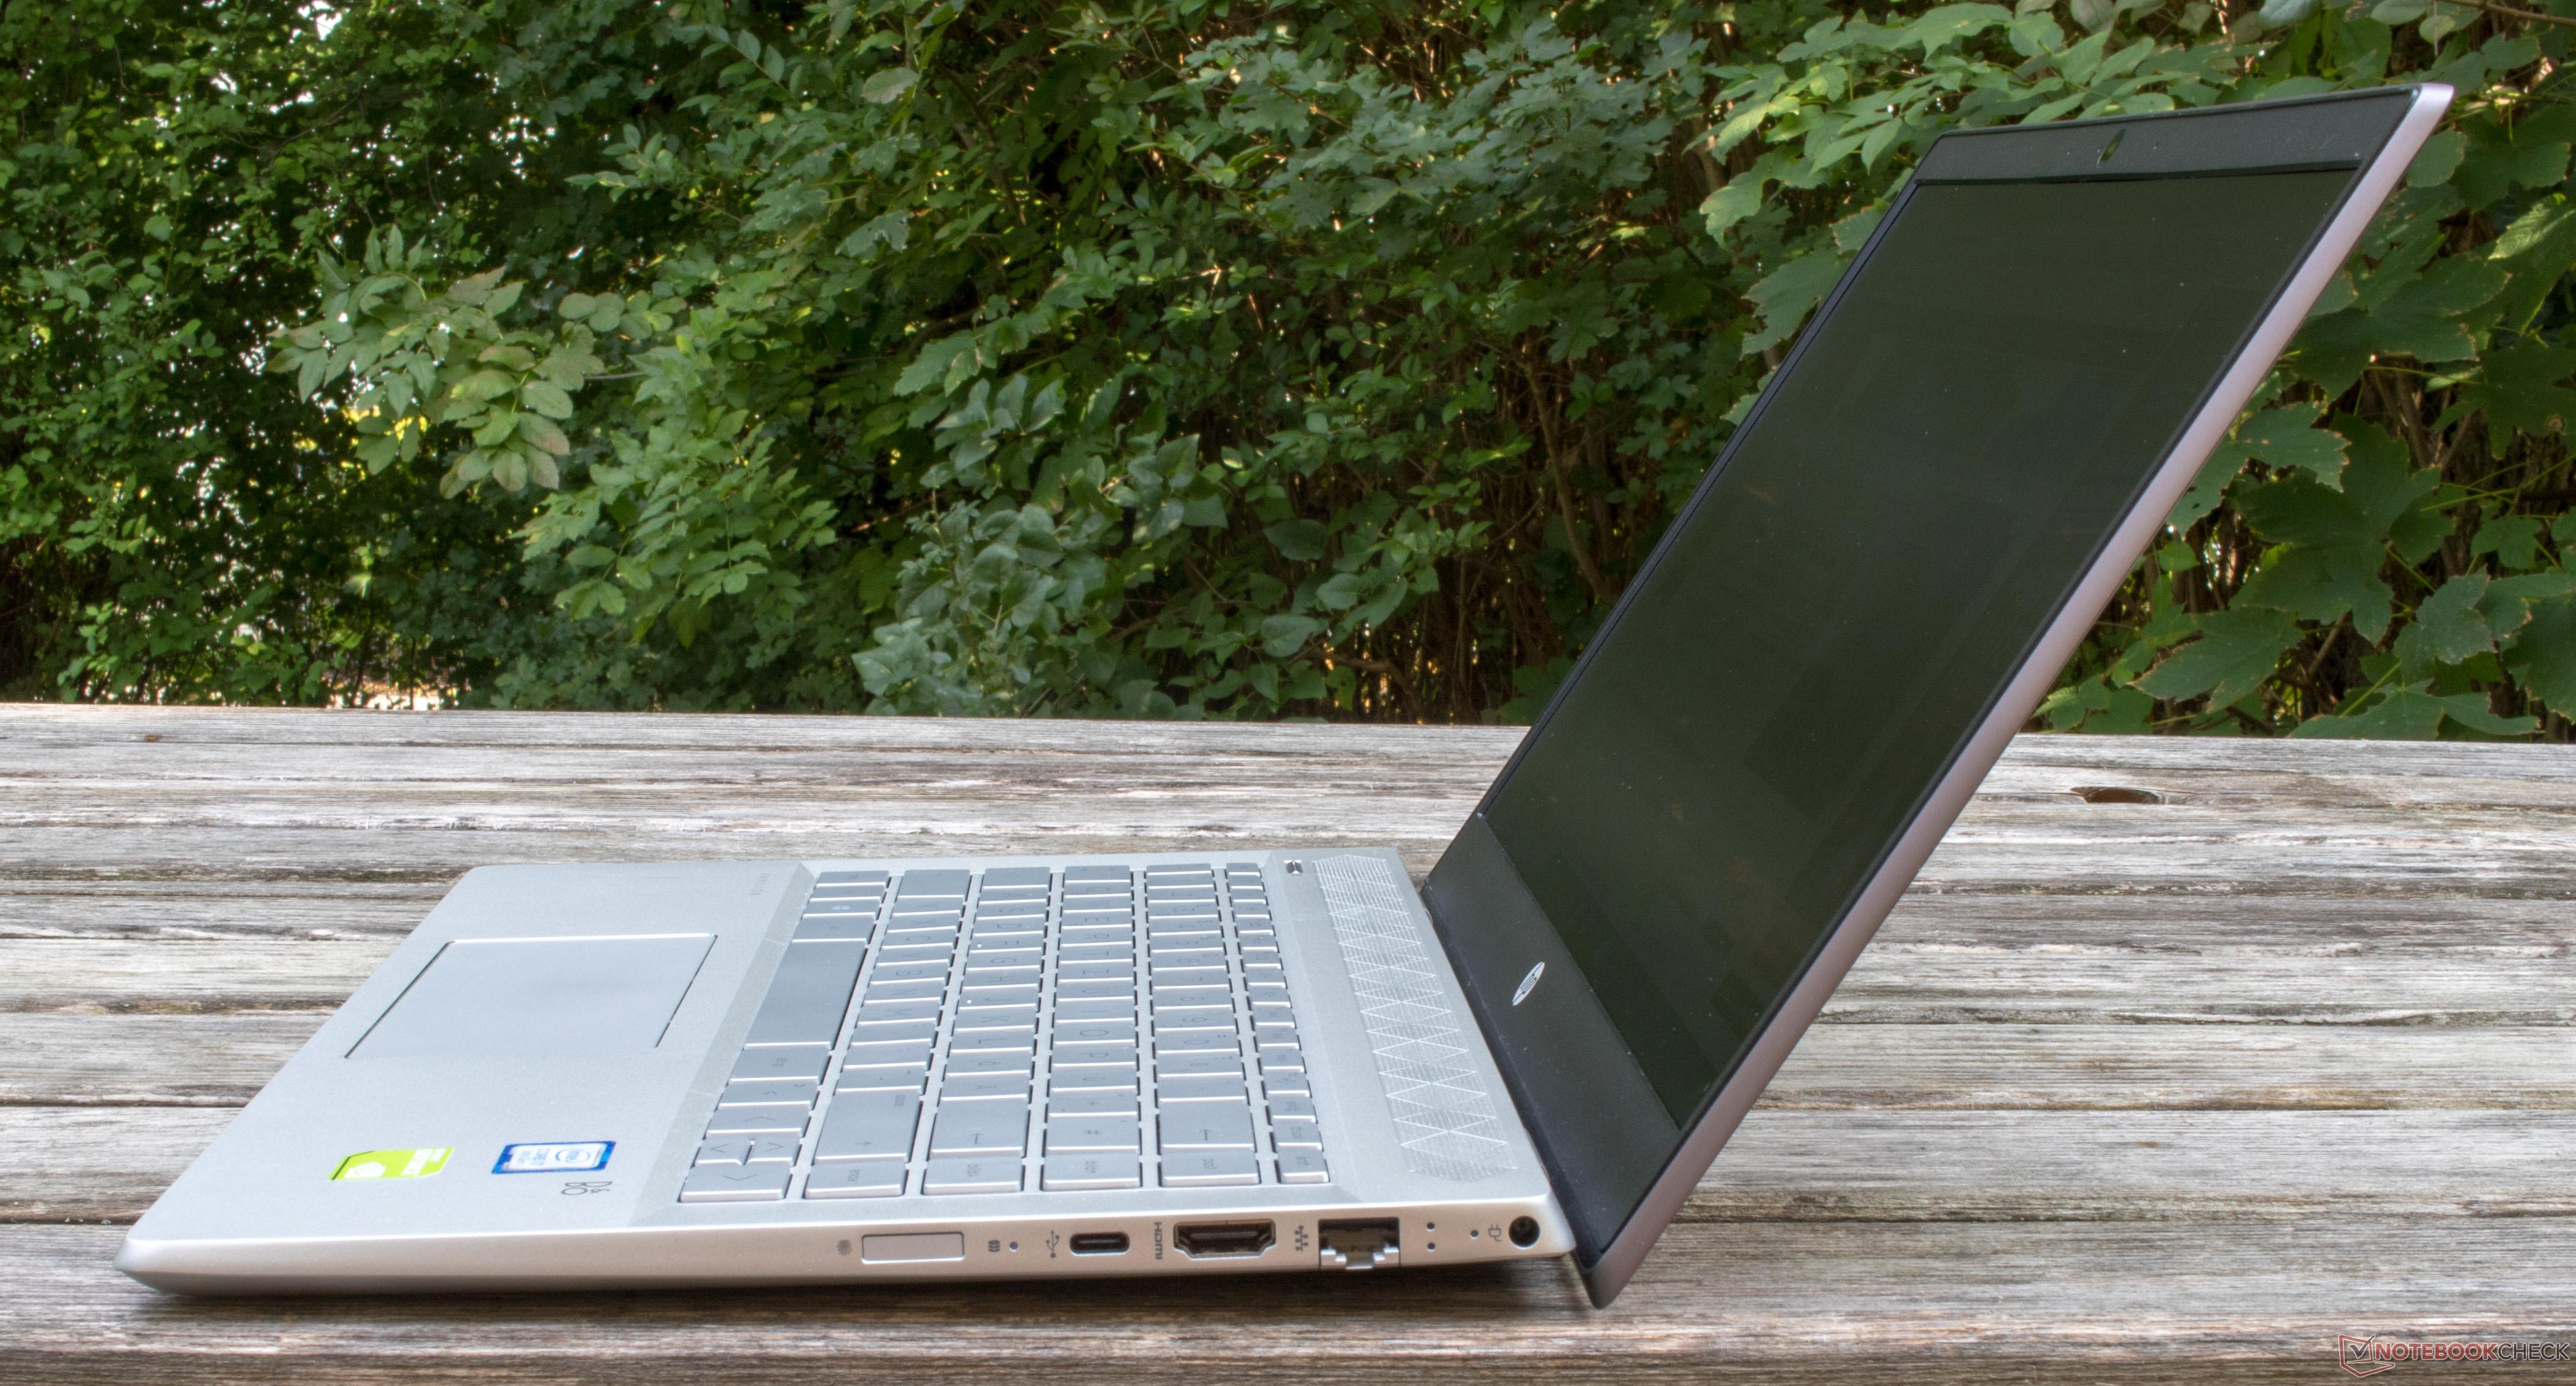 Hp Pavilion 14 I7 8550u Mx150 Laptop Review Notebookcheck Net Reviews